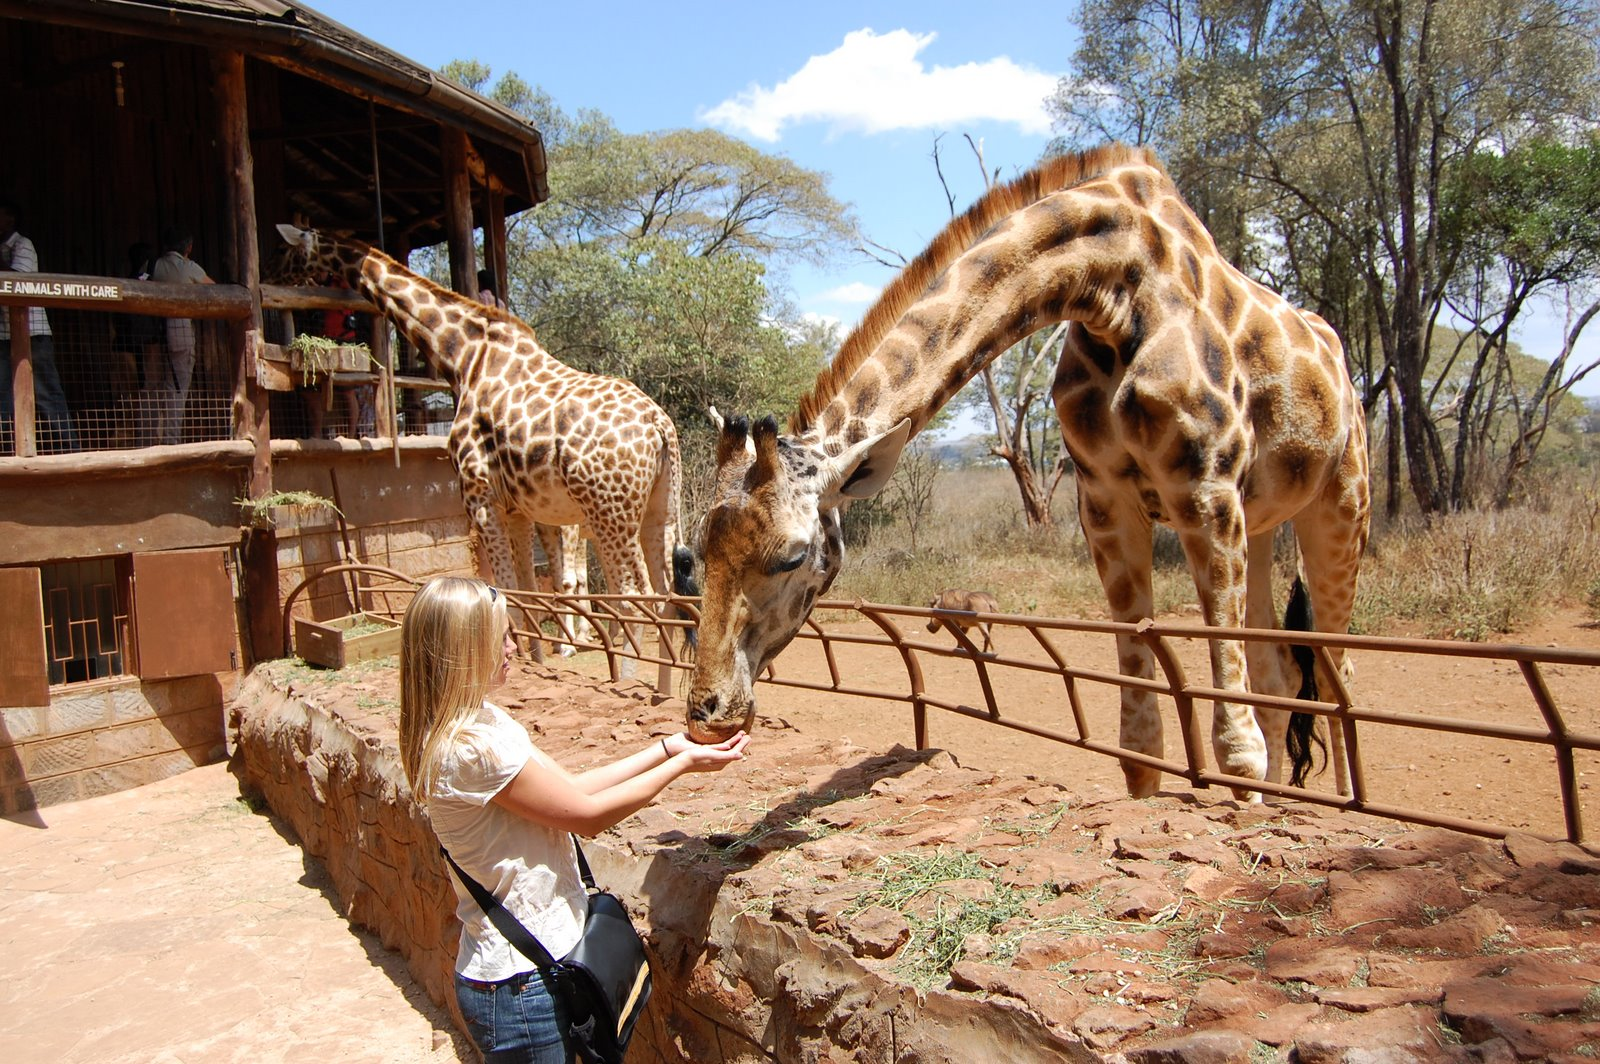 http://www.prasannaholidays.com/wp-content/uploads/2014/06/Giraffe-Center-Nairobi.jpg